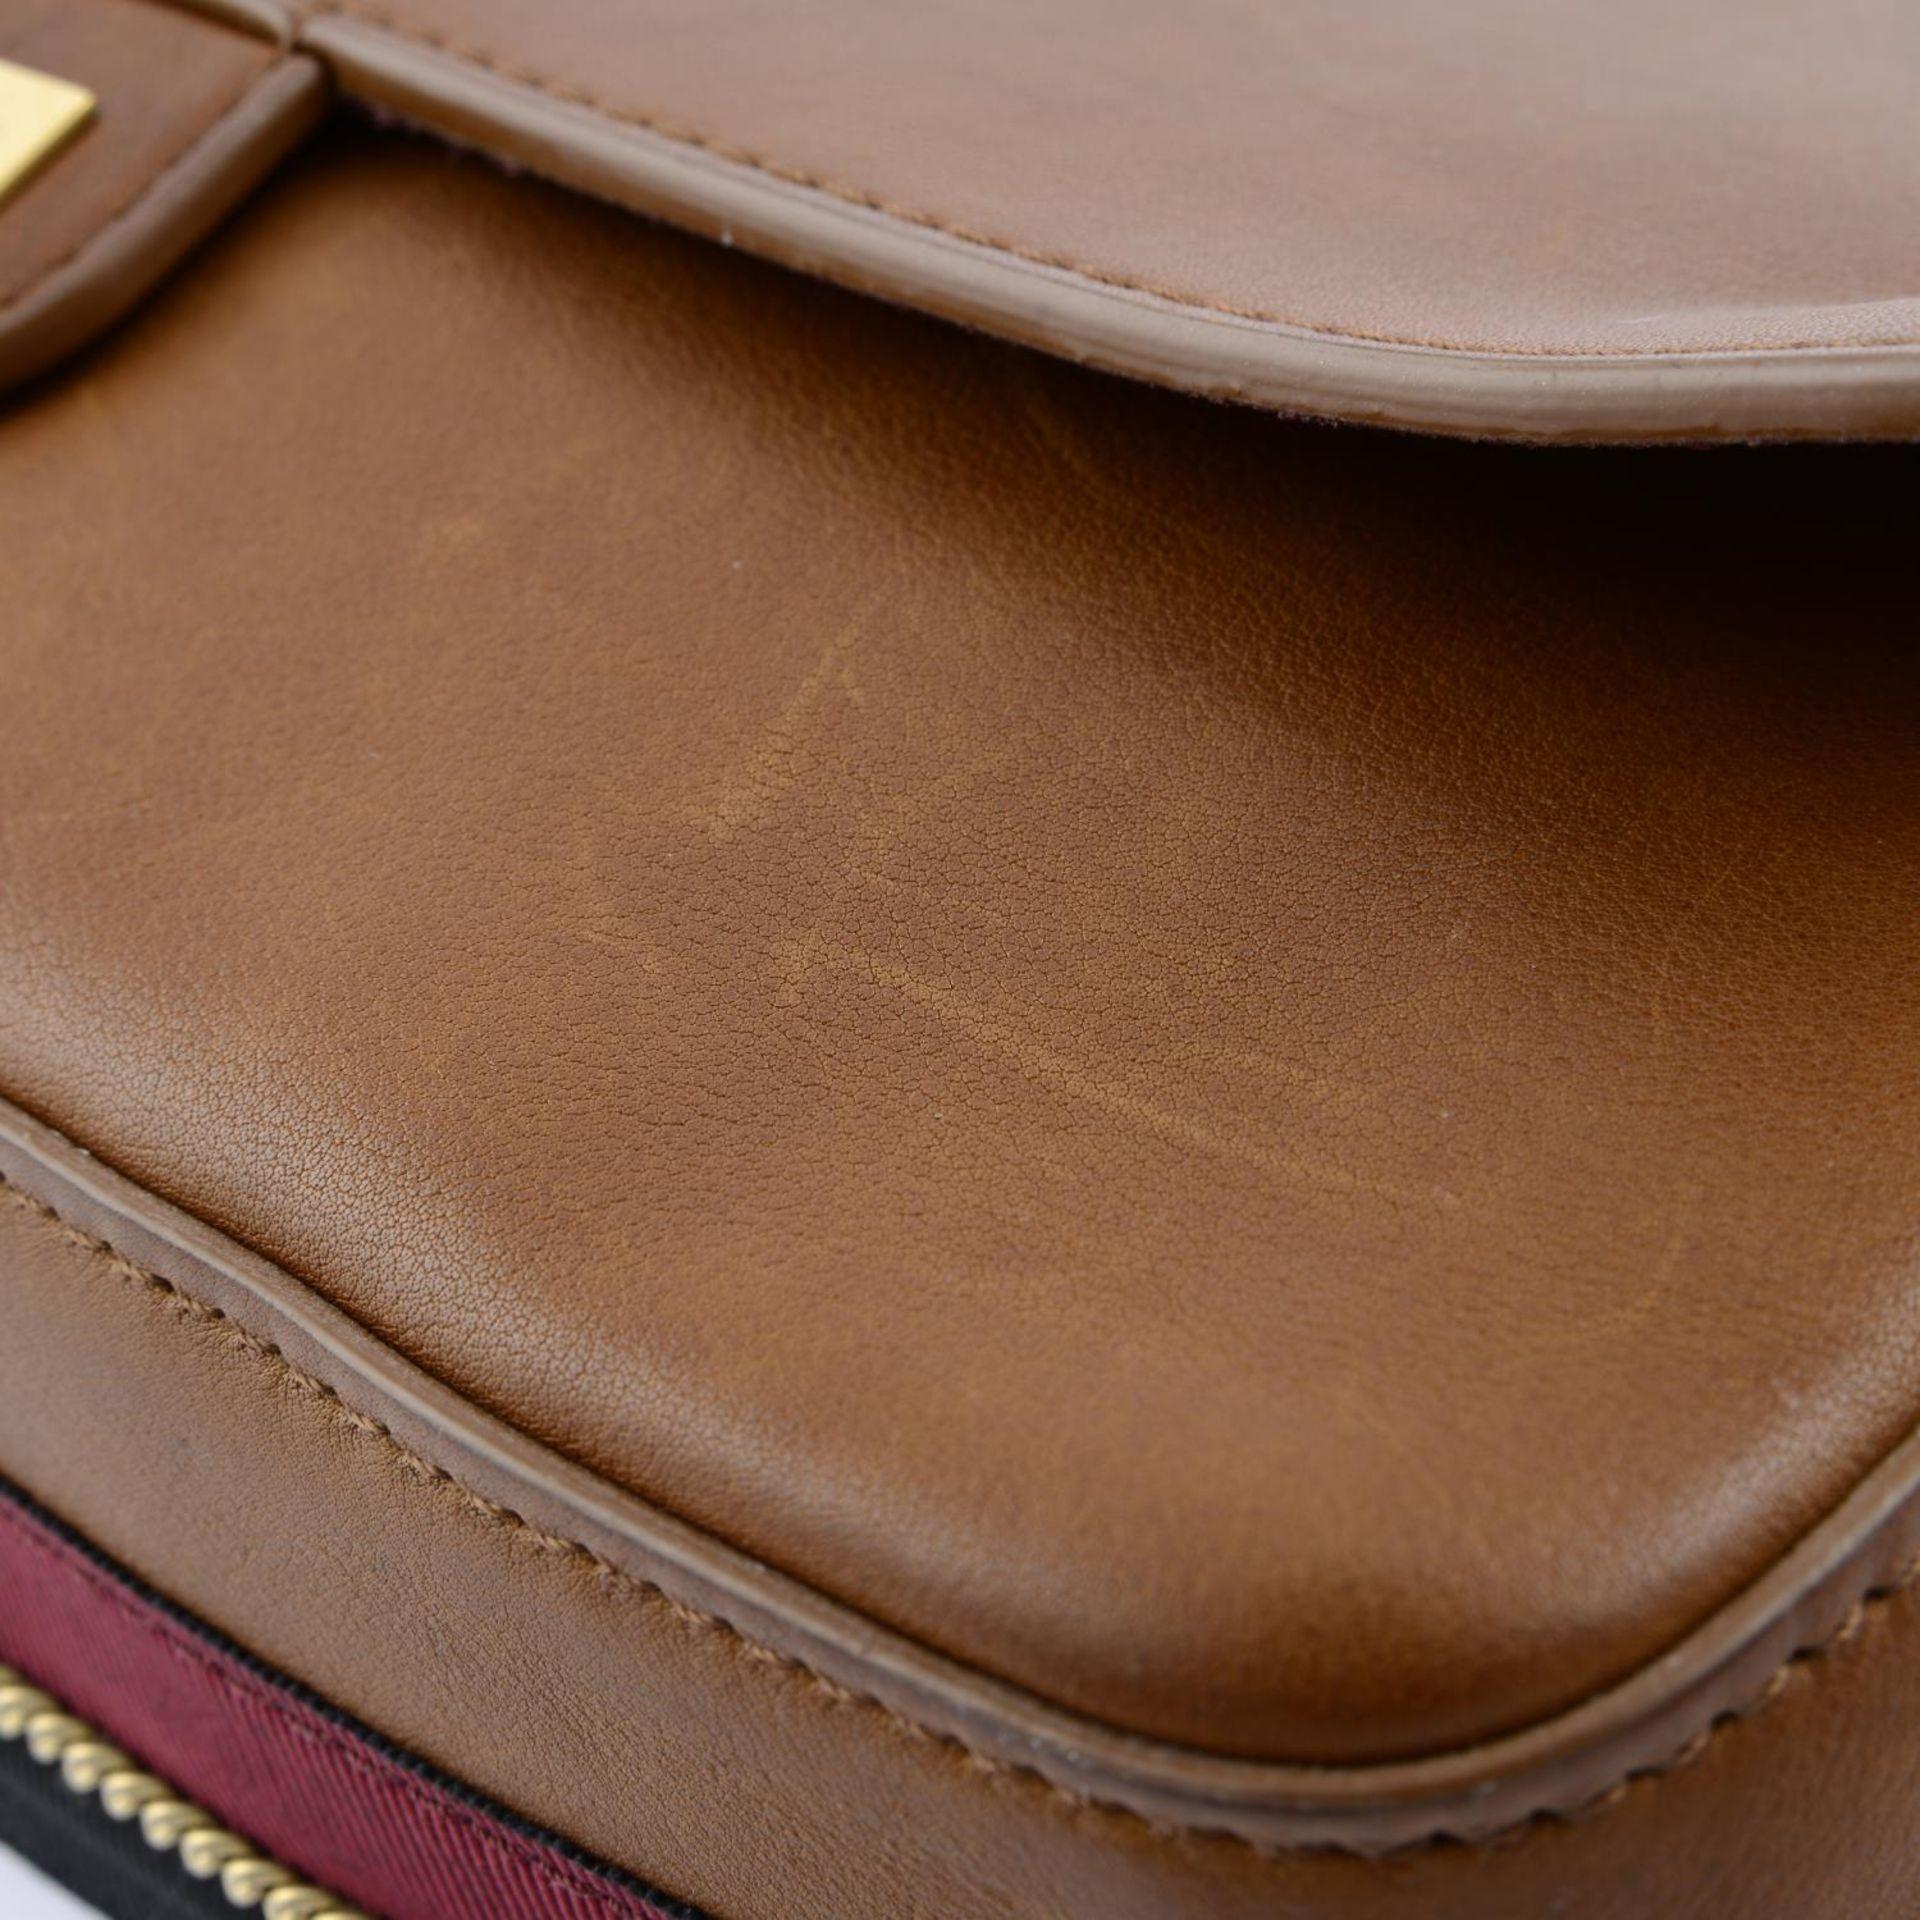 CHANEL - a special edition tan 2.55 Nude Medallion Reissue 226 handbag. - Image 5 of 5